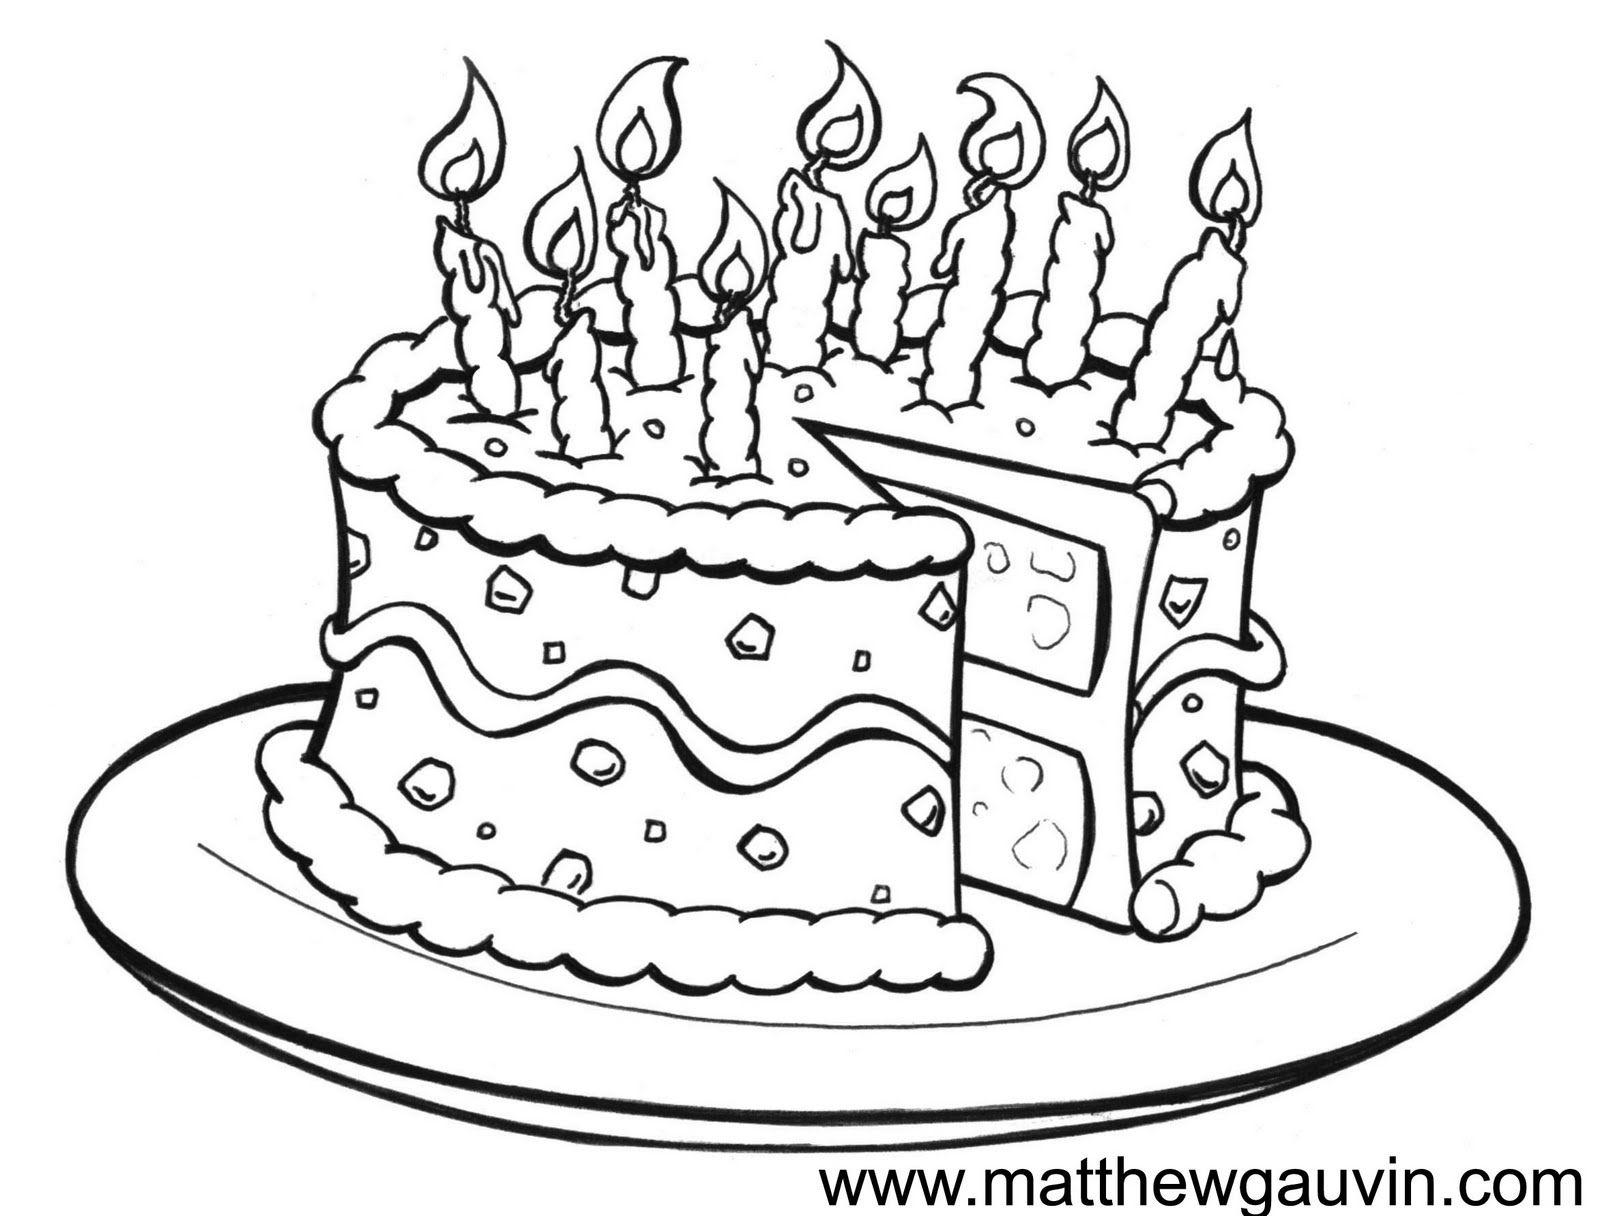 1600x1216 Birthday Drawings Mg Children's Book Illustrations Birthday